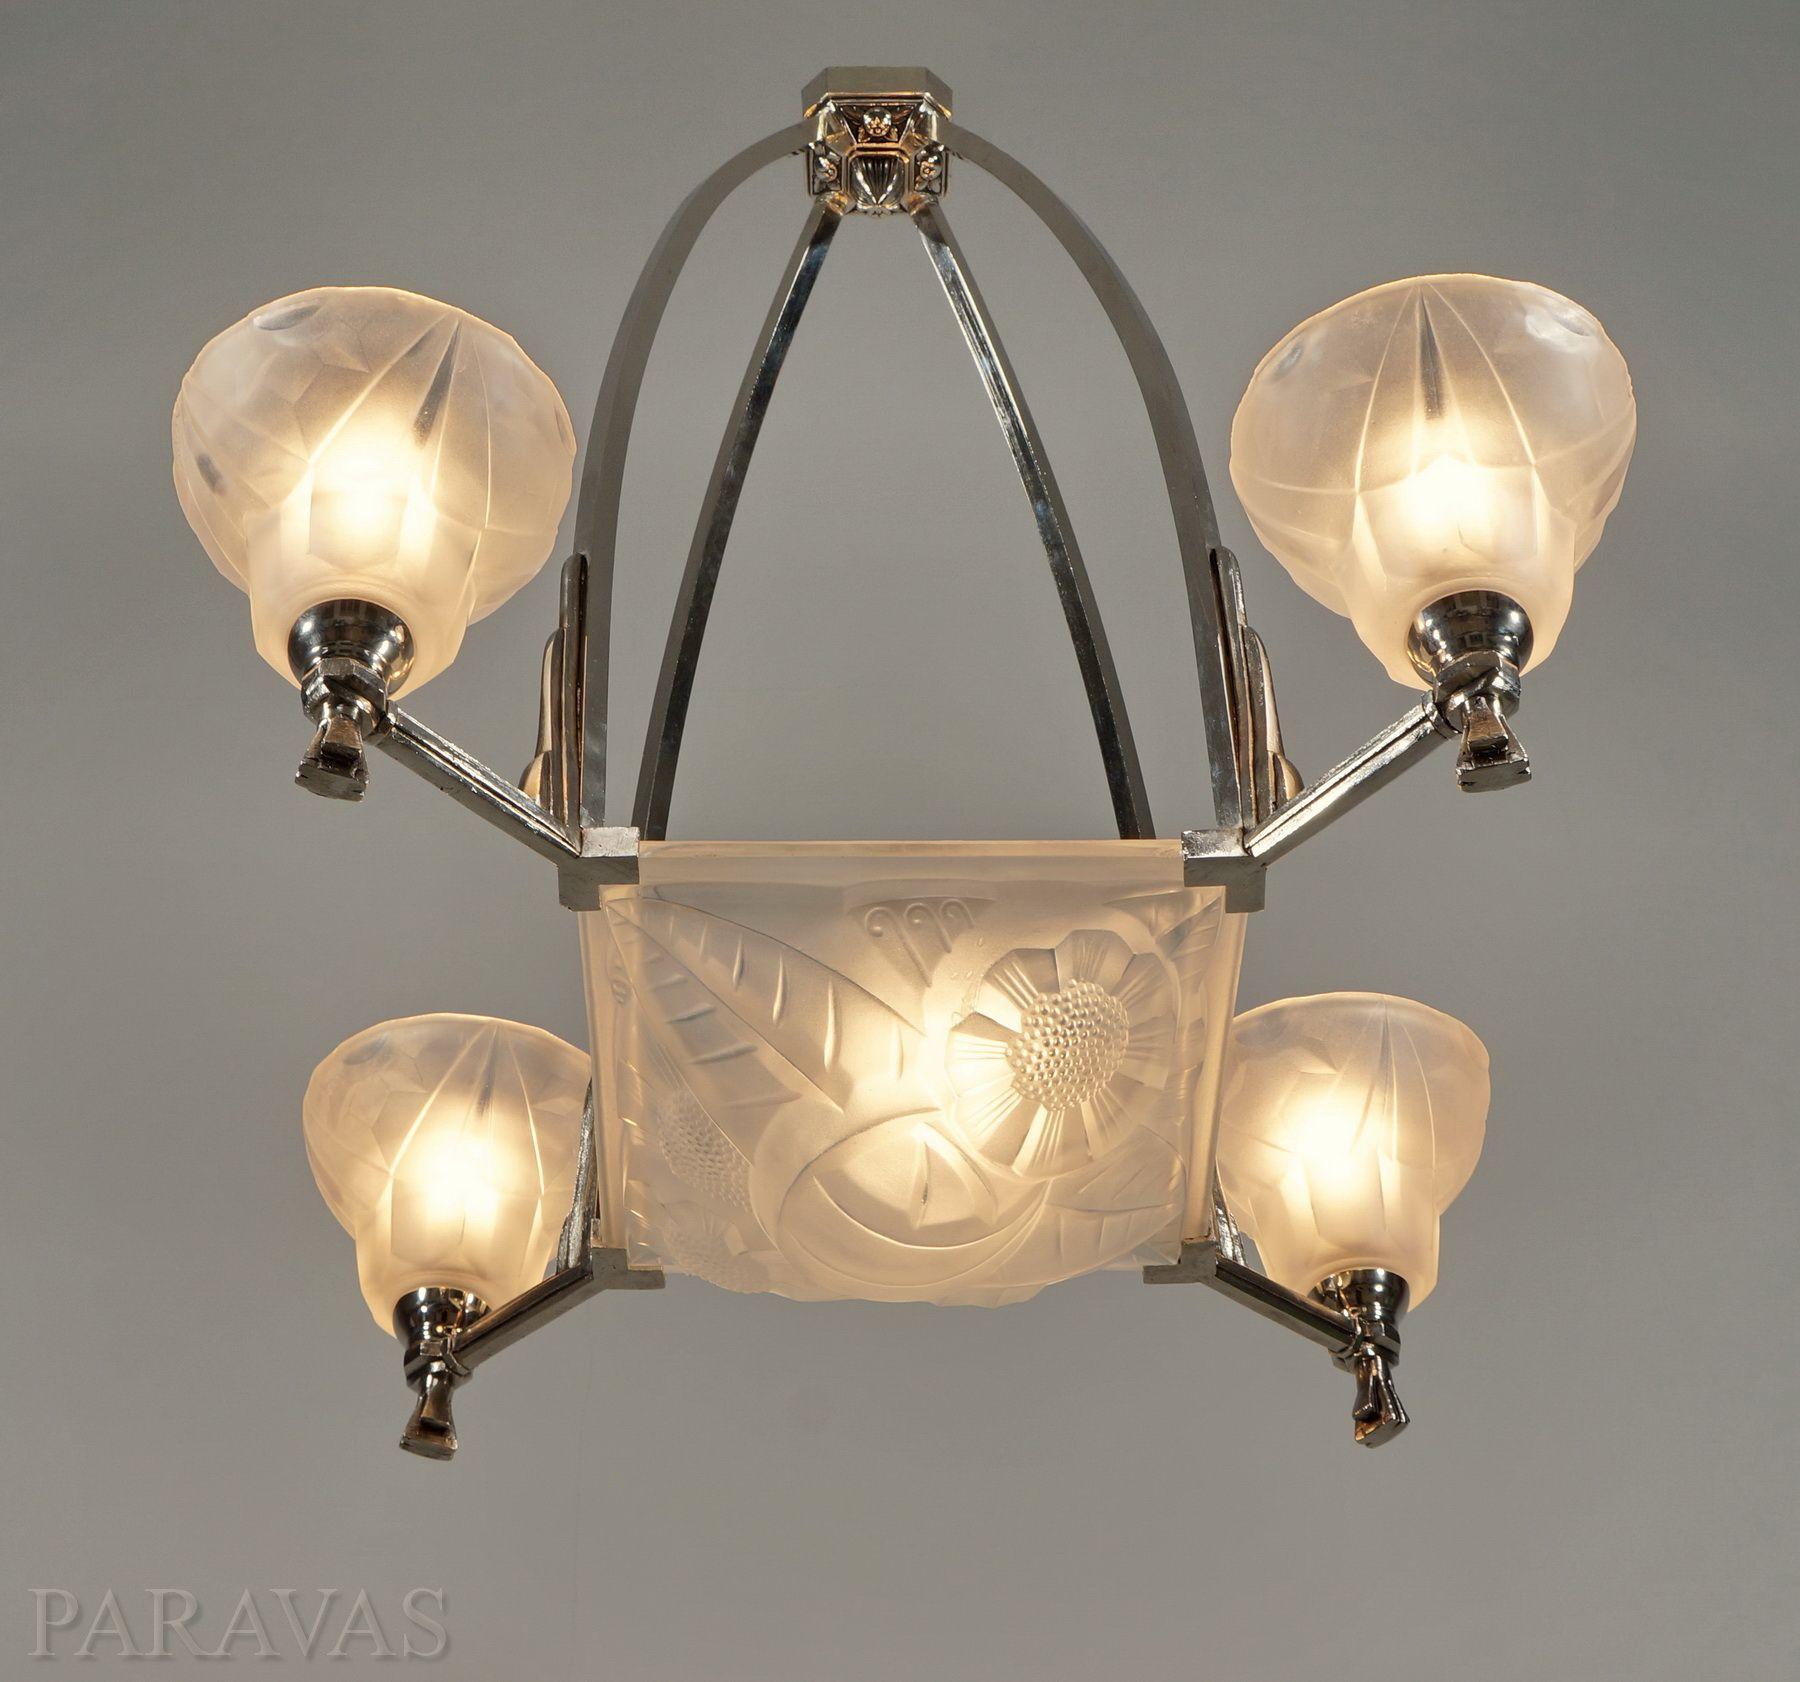 DeguÉ French 1930 Art Deco Chandelier Paravas Ebay